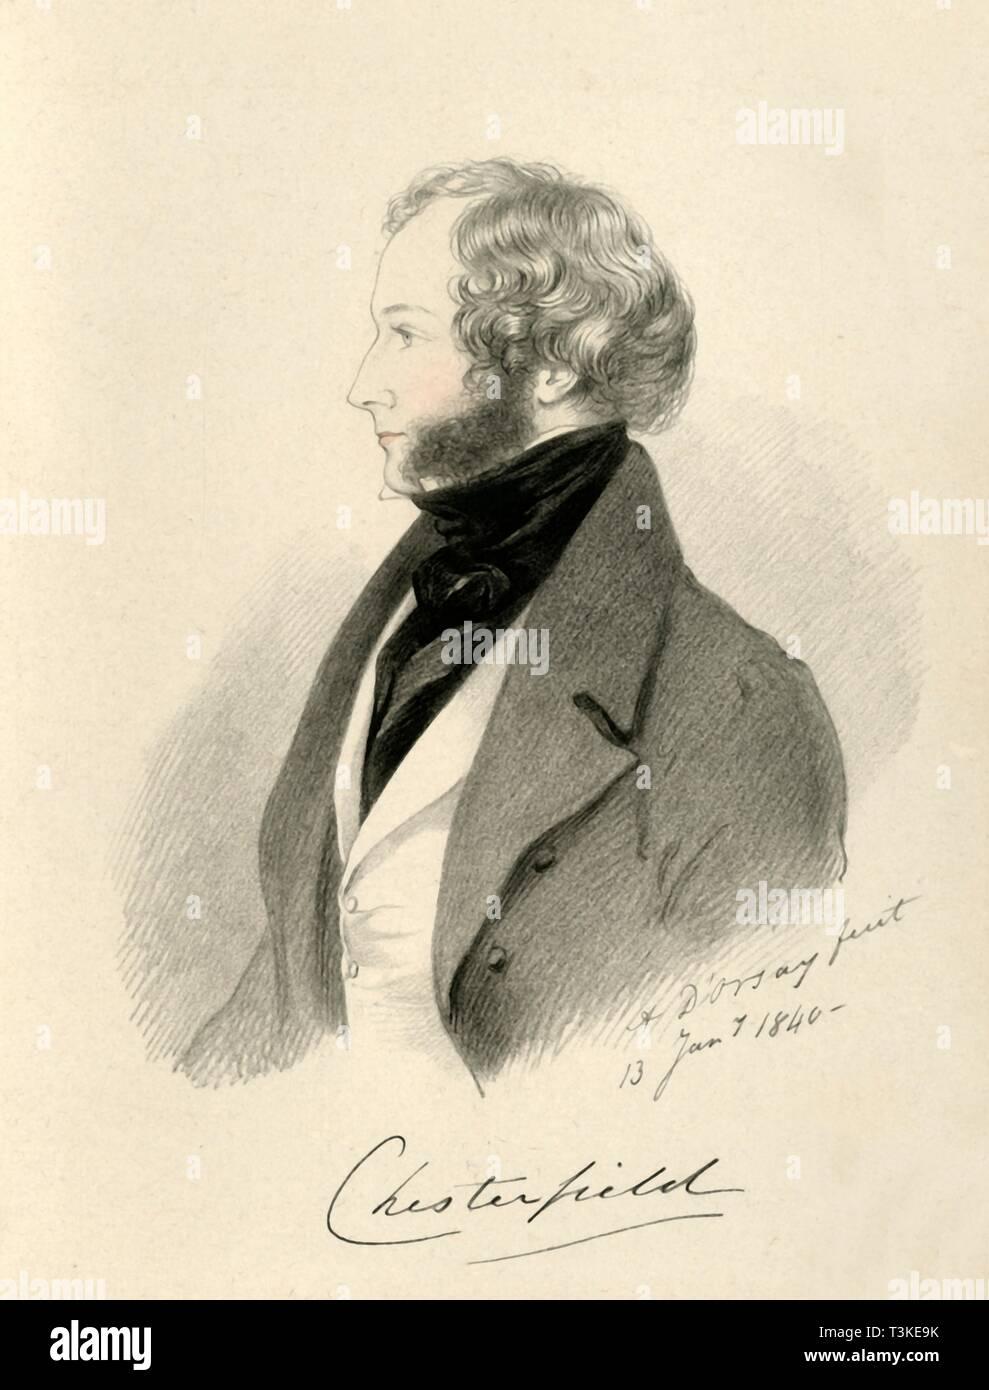 'The Earl of Chesterfield', 1840. Creator: Richard James Lane. - Stock Image